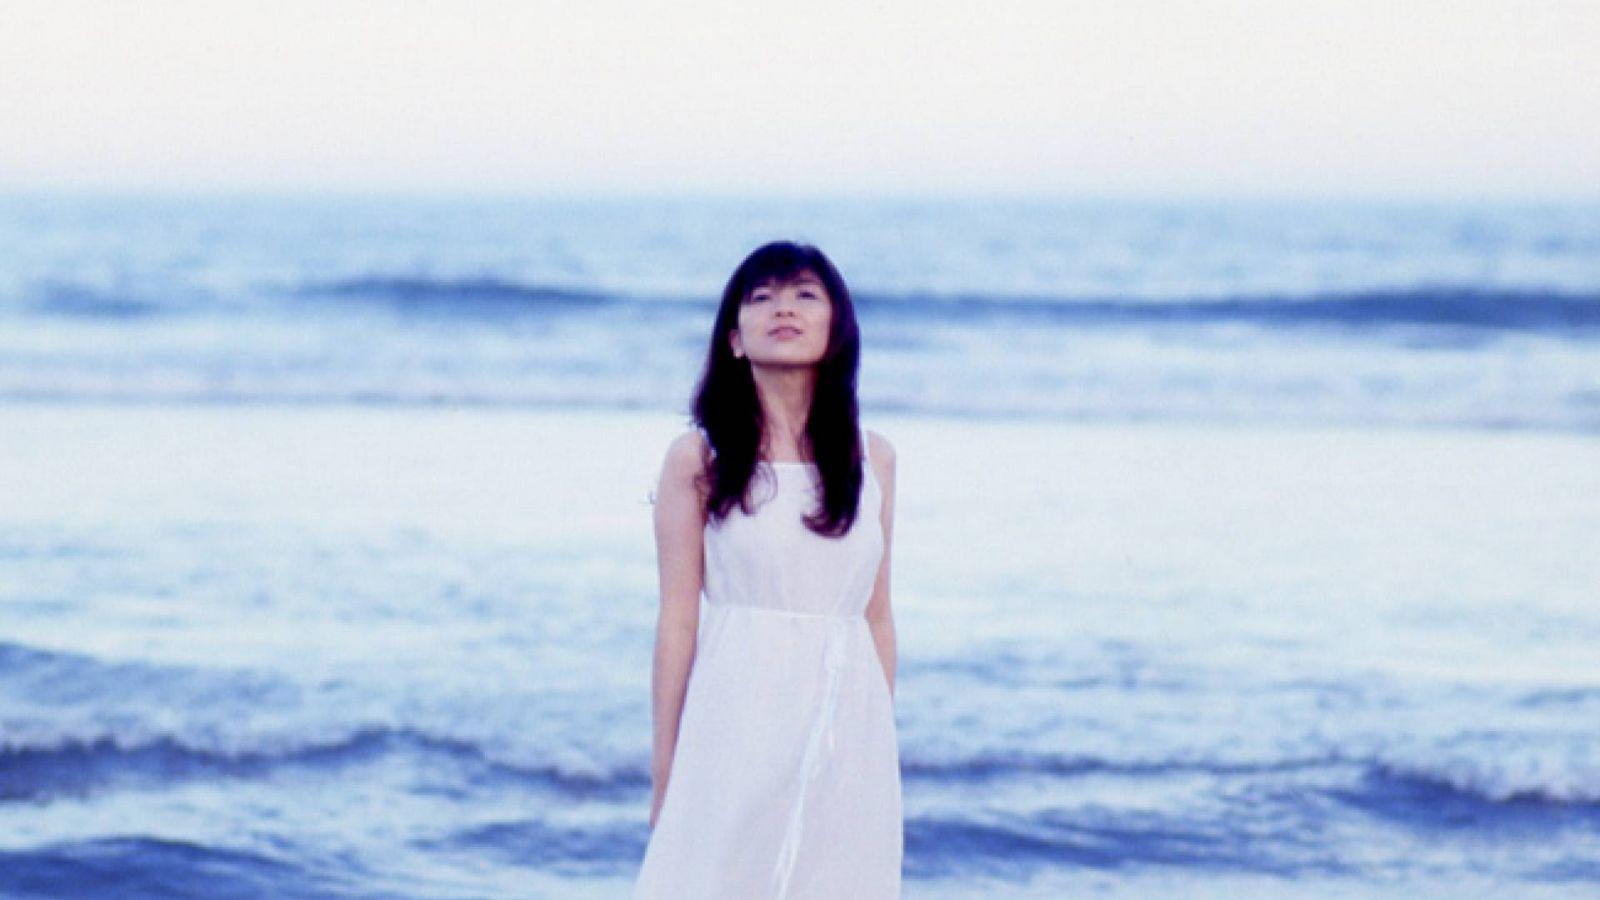 Onodera Ayano © Ayano Onodera